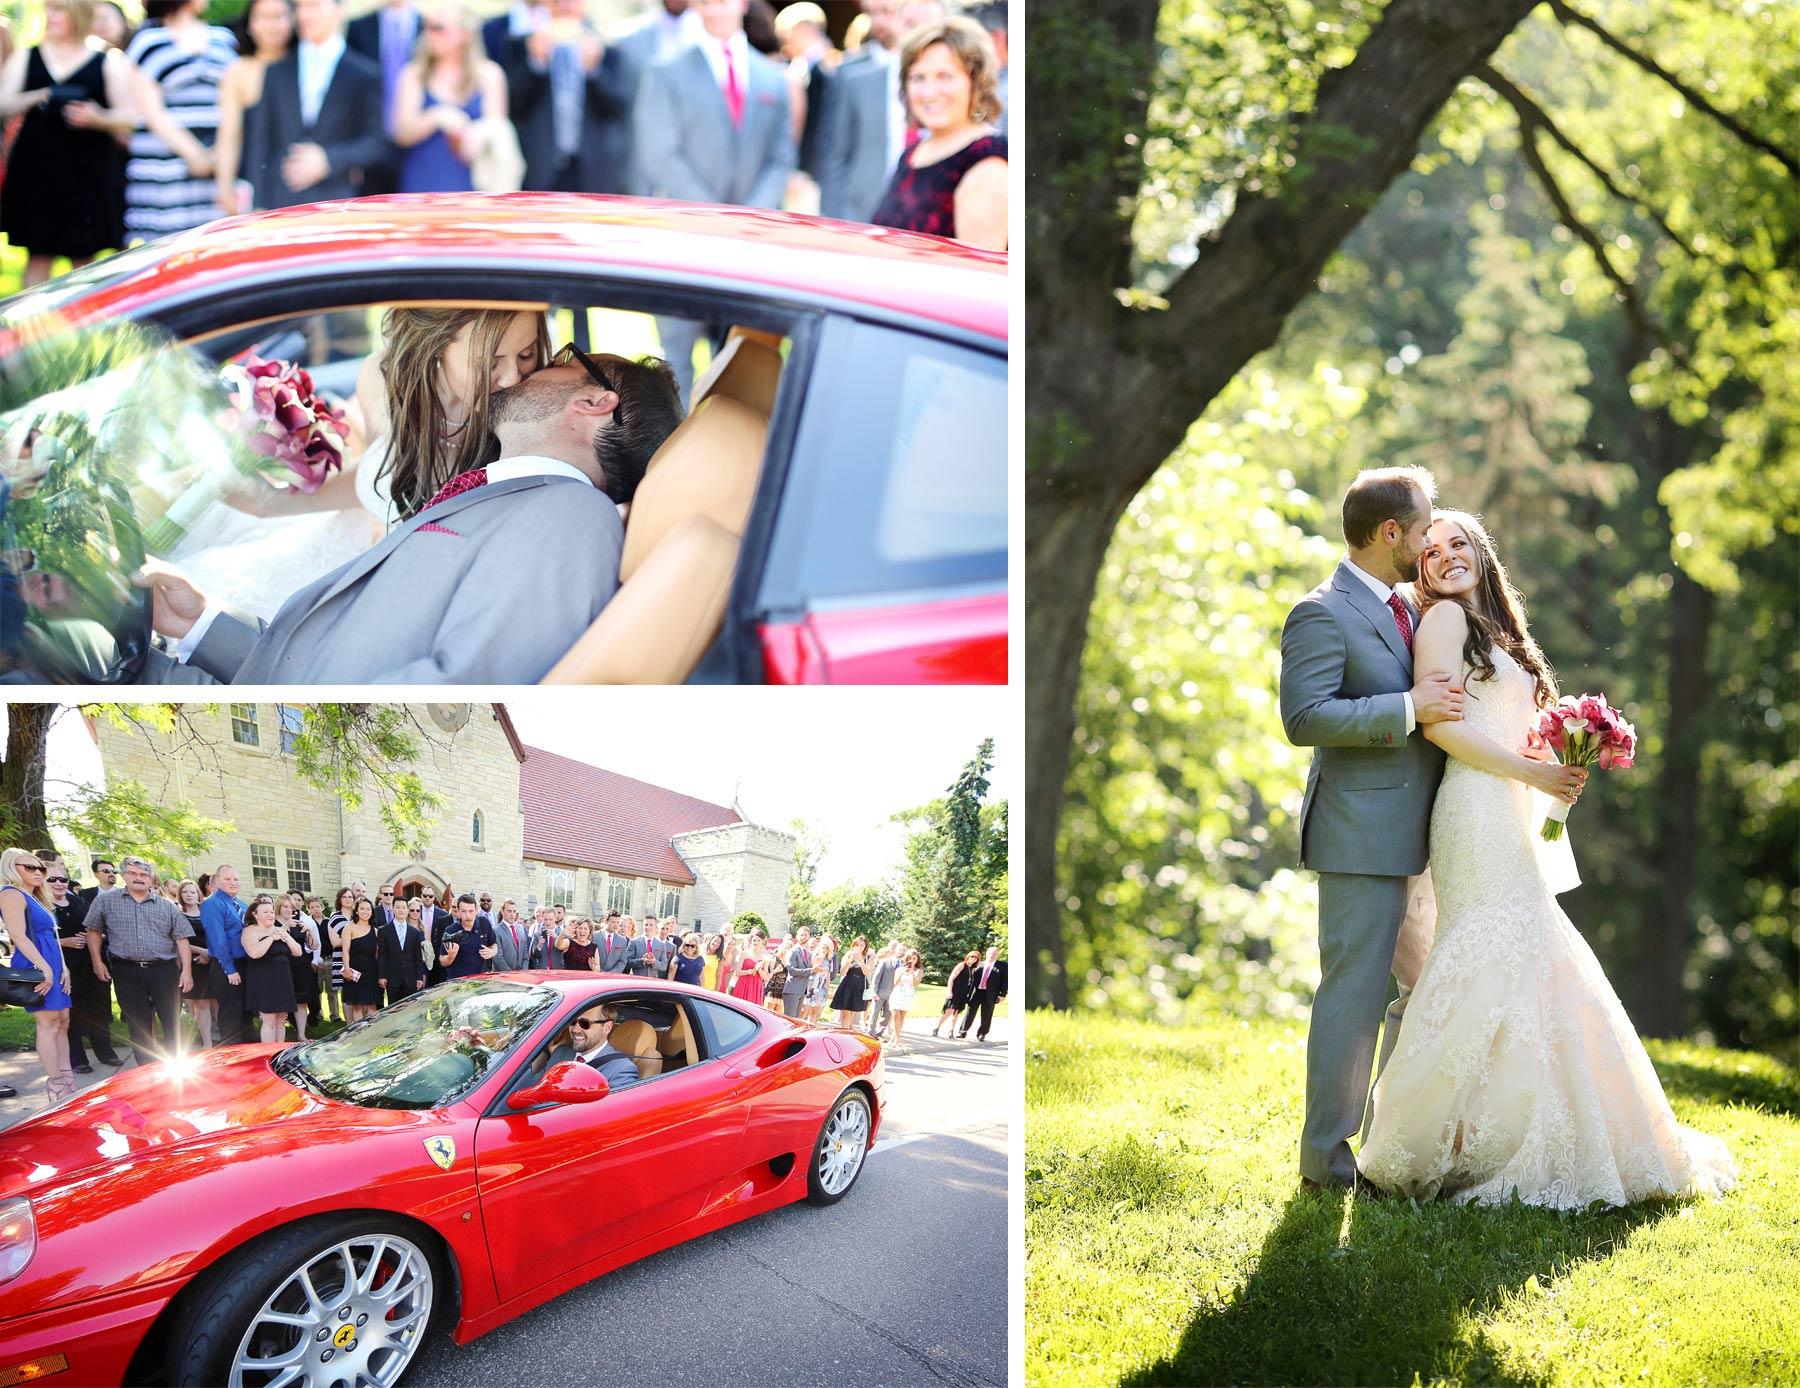 19-Minneapolis-Minnesota-Wedding-Photographer-by-Andrew-Vick-Photography-Summer-Diamond-Lake-Church-Classic-Car-Kiss-Embrace-Bride-Groom-Natalie-and-Andrew.jpg